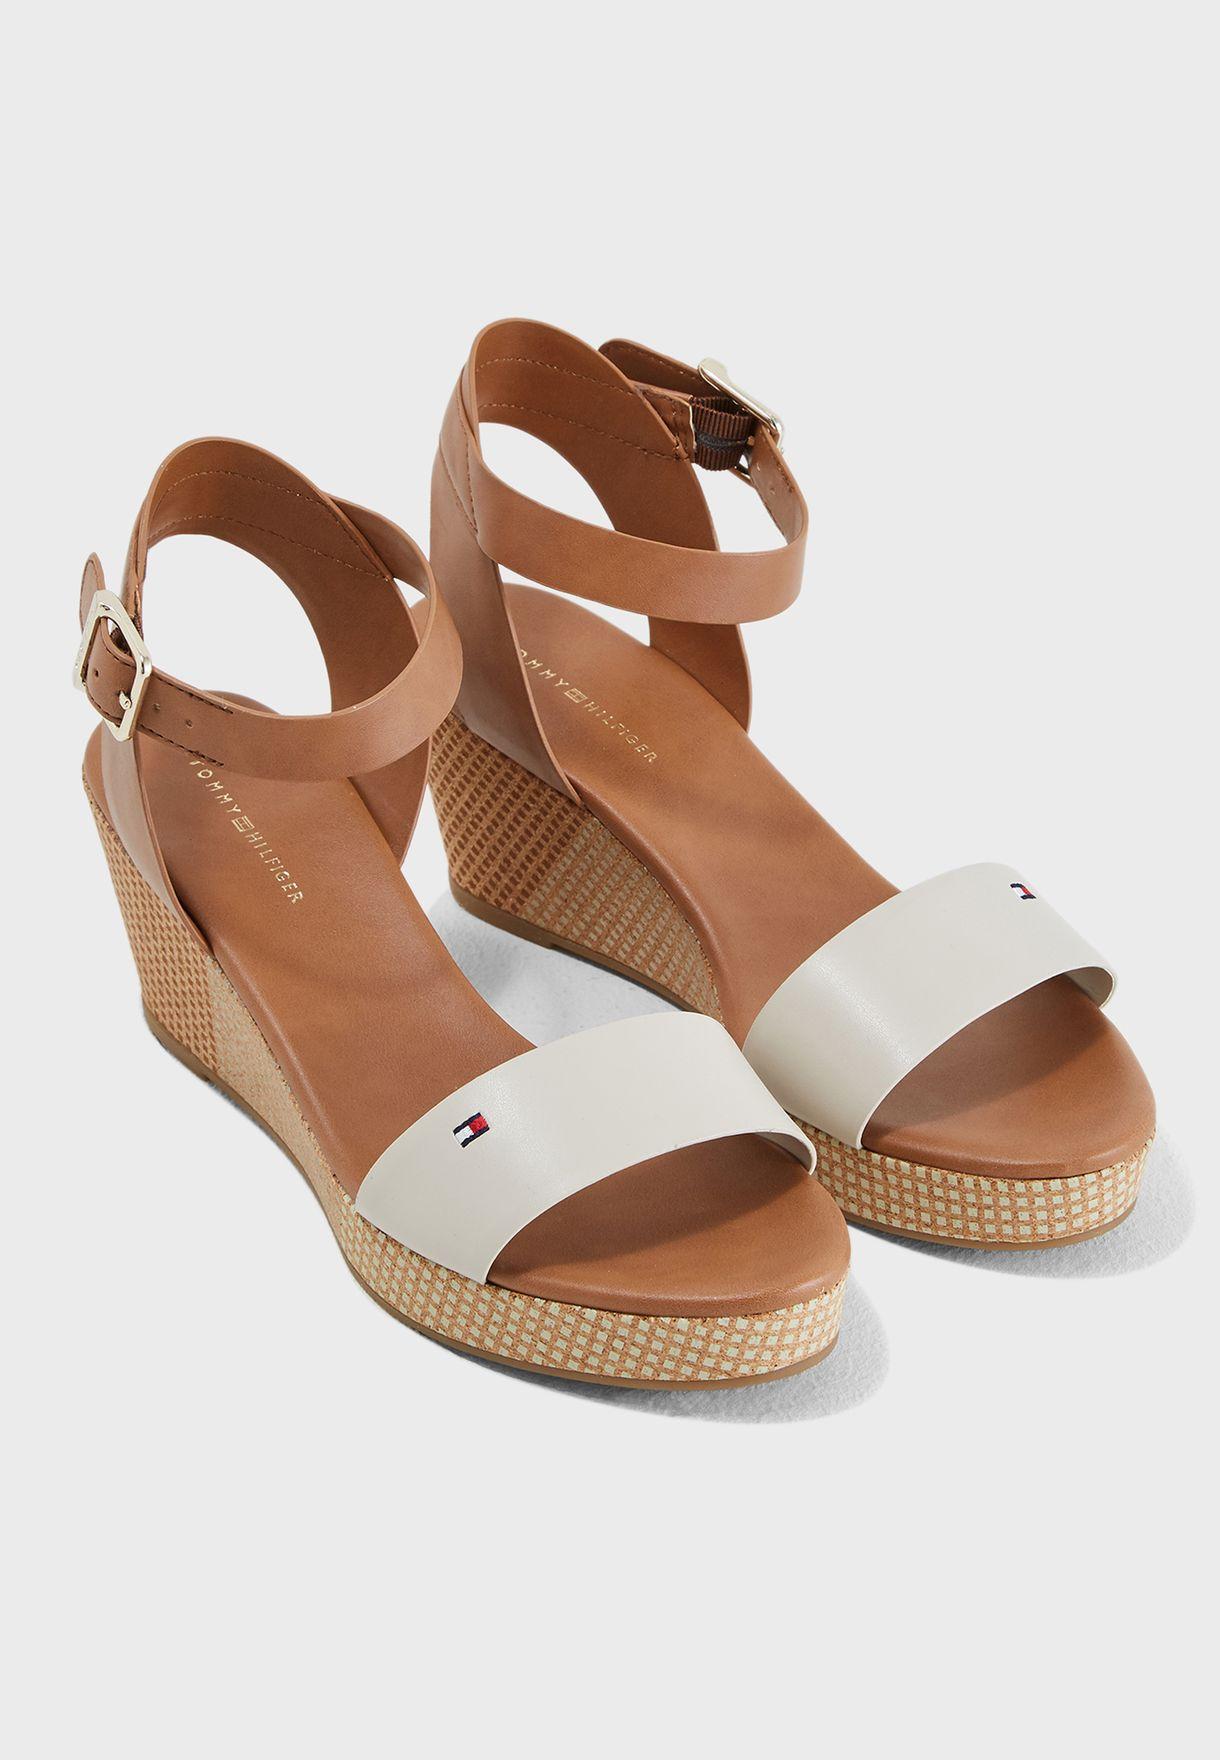 9e135d12e423 Shop Tommy Hilfiger multicolor Feminine Mid Wedge Sandal ...